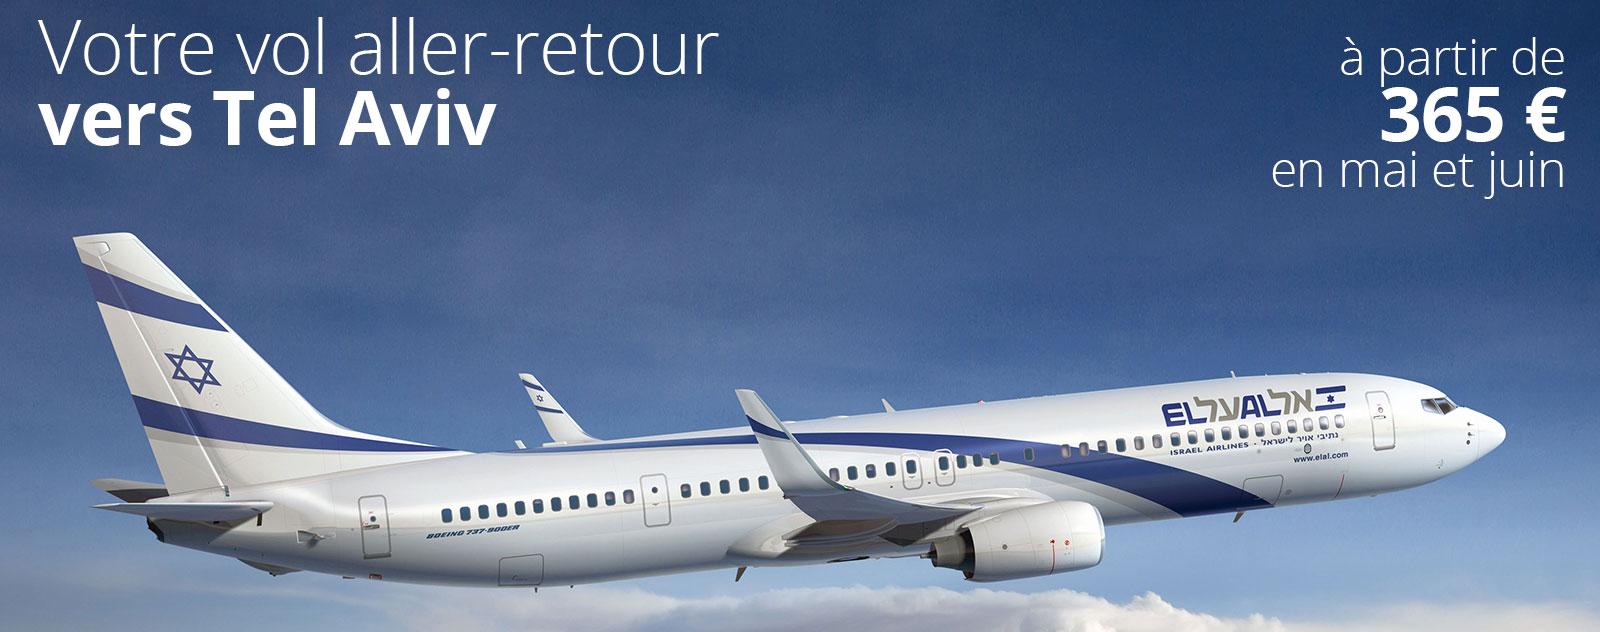 Votre vol vers Tel Aviv